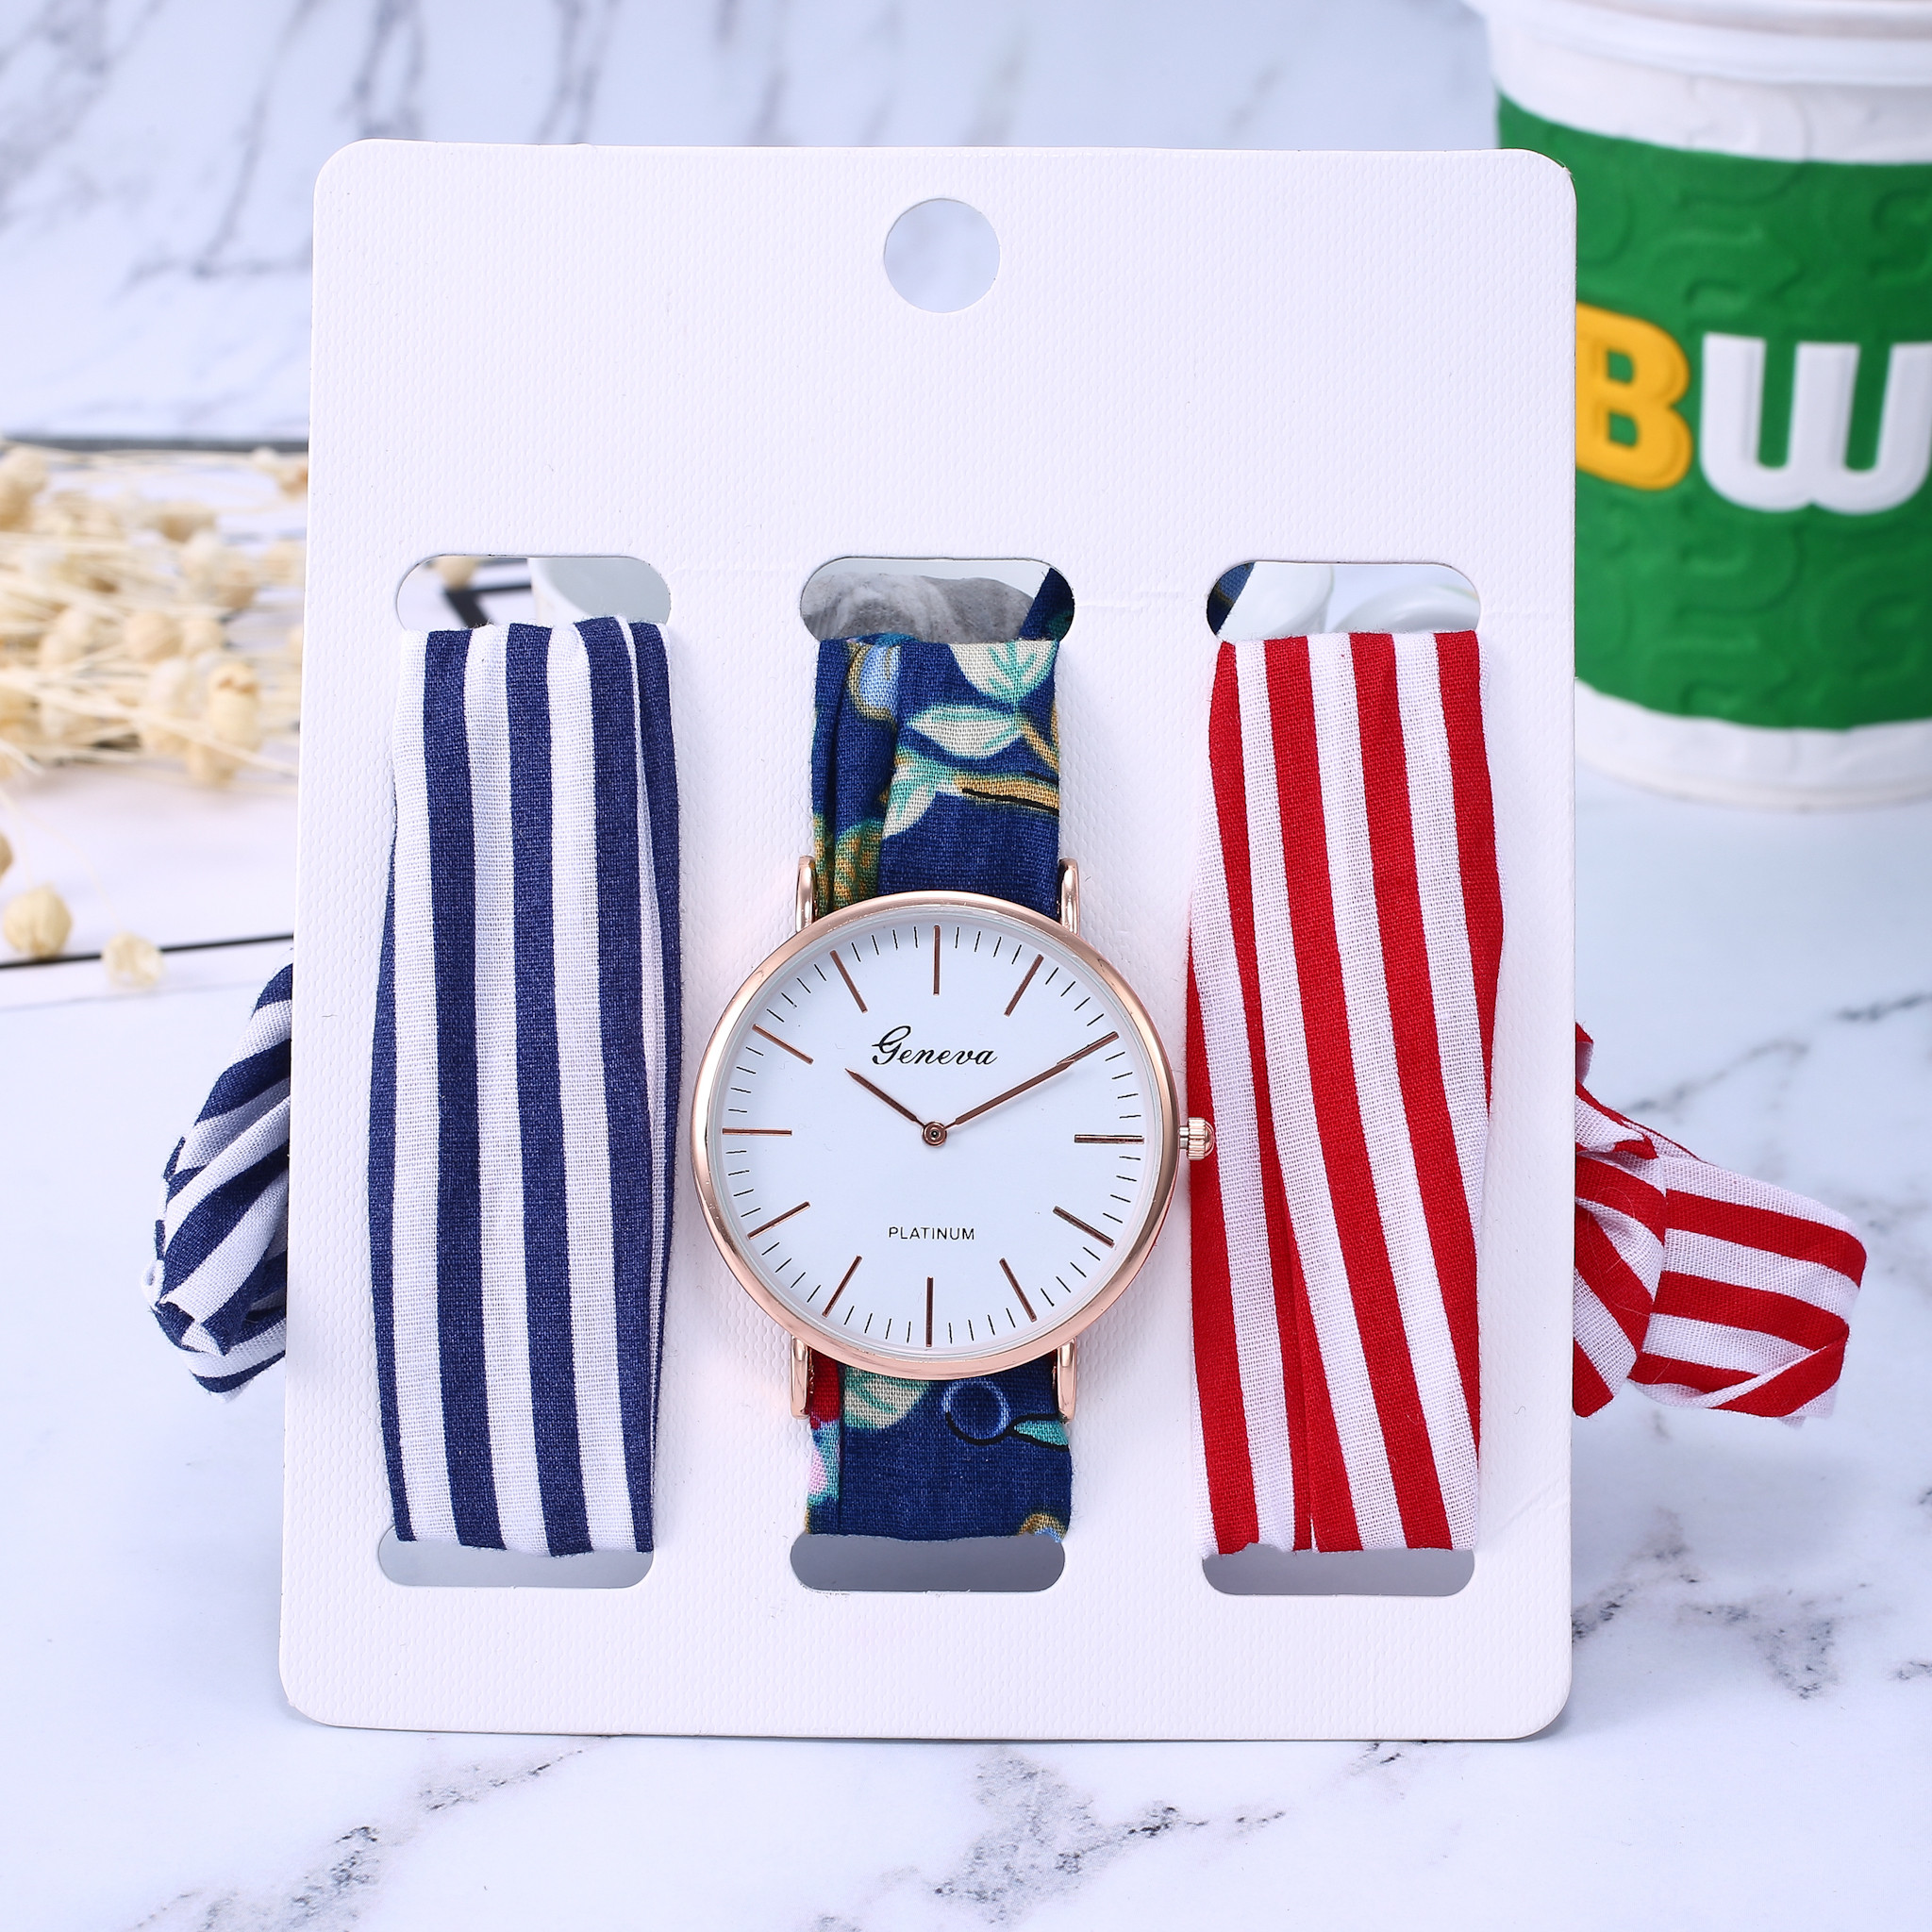 New Wrist Watches Sets Lady Holiday Dress Cotton Ribbon Watch Women Gold Silver Clock Watch For Women, 3pcs Ribbon Reloj Mujer